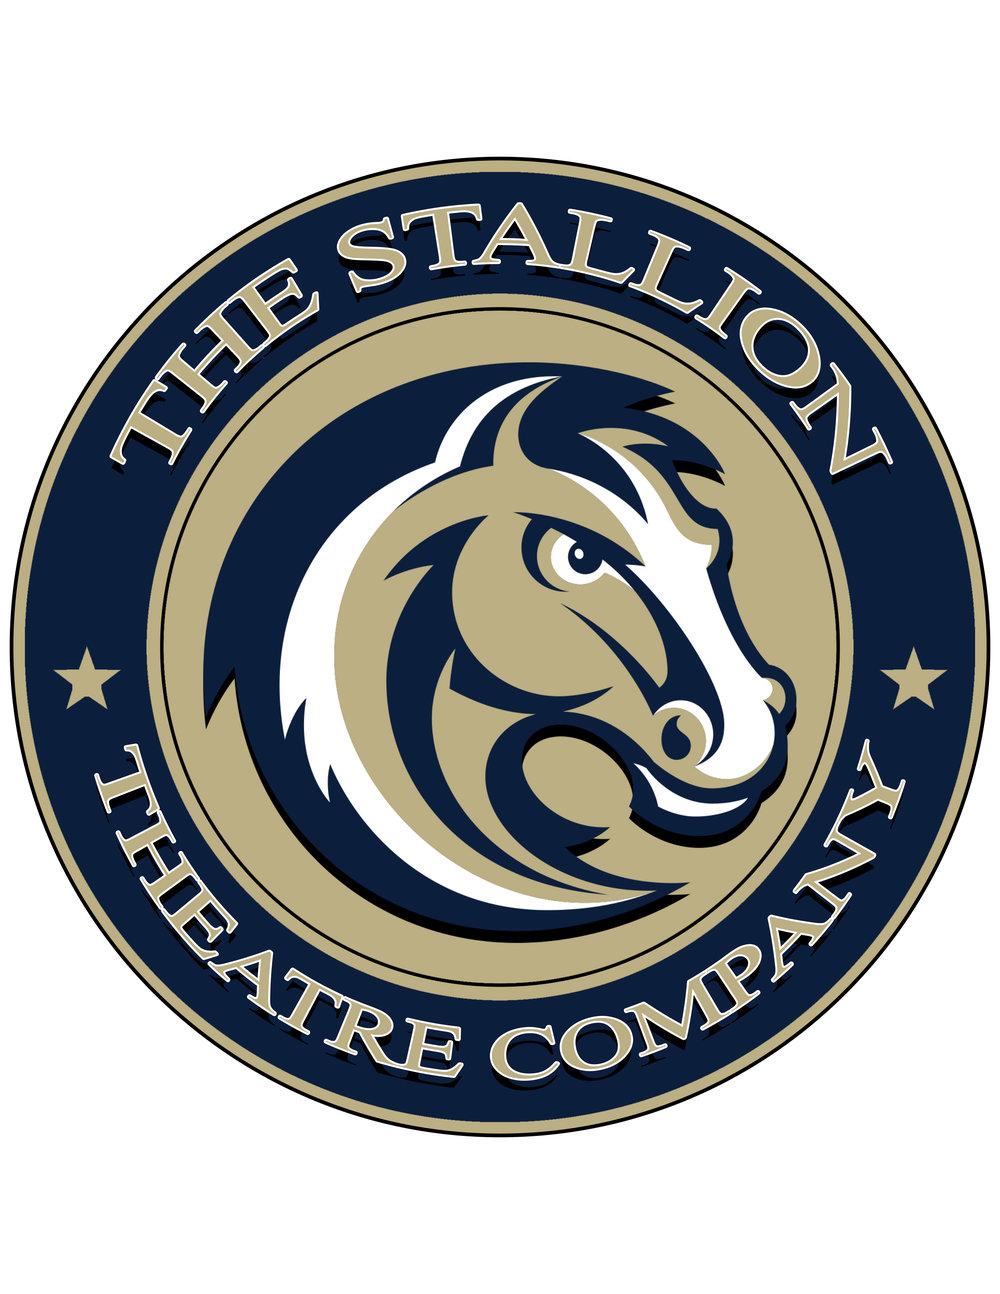 STC logo 6 (1).jpg